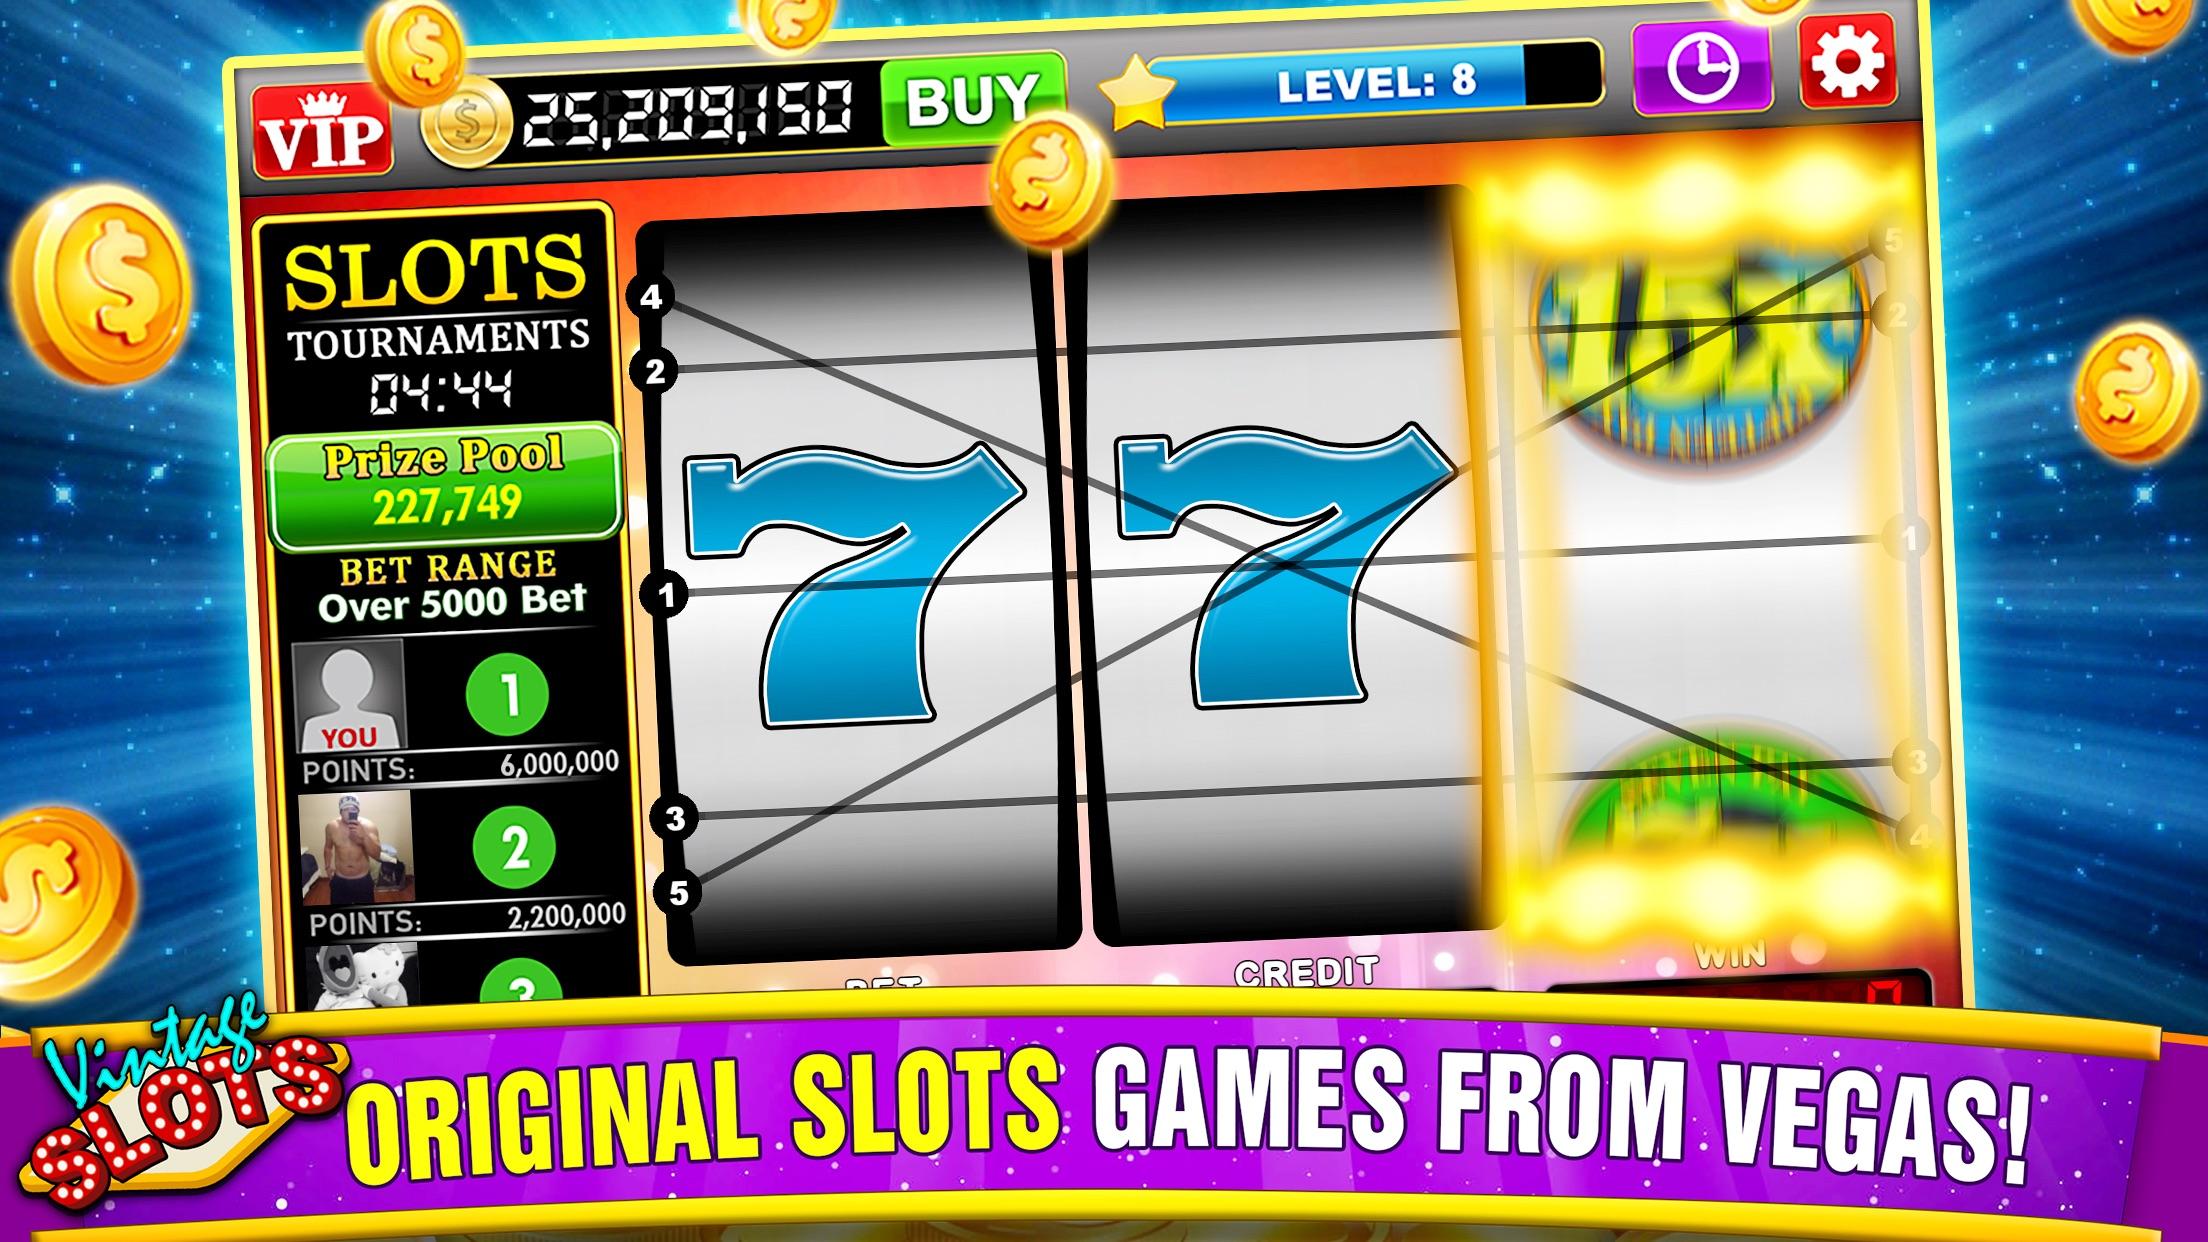 Vintage Slots Las Vegas - Old Slot Machine Games! Screenshot